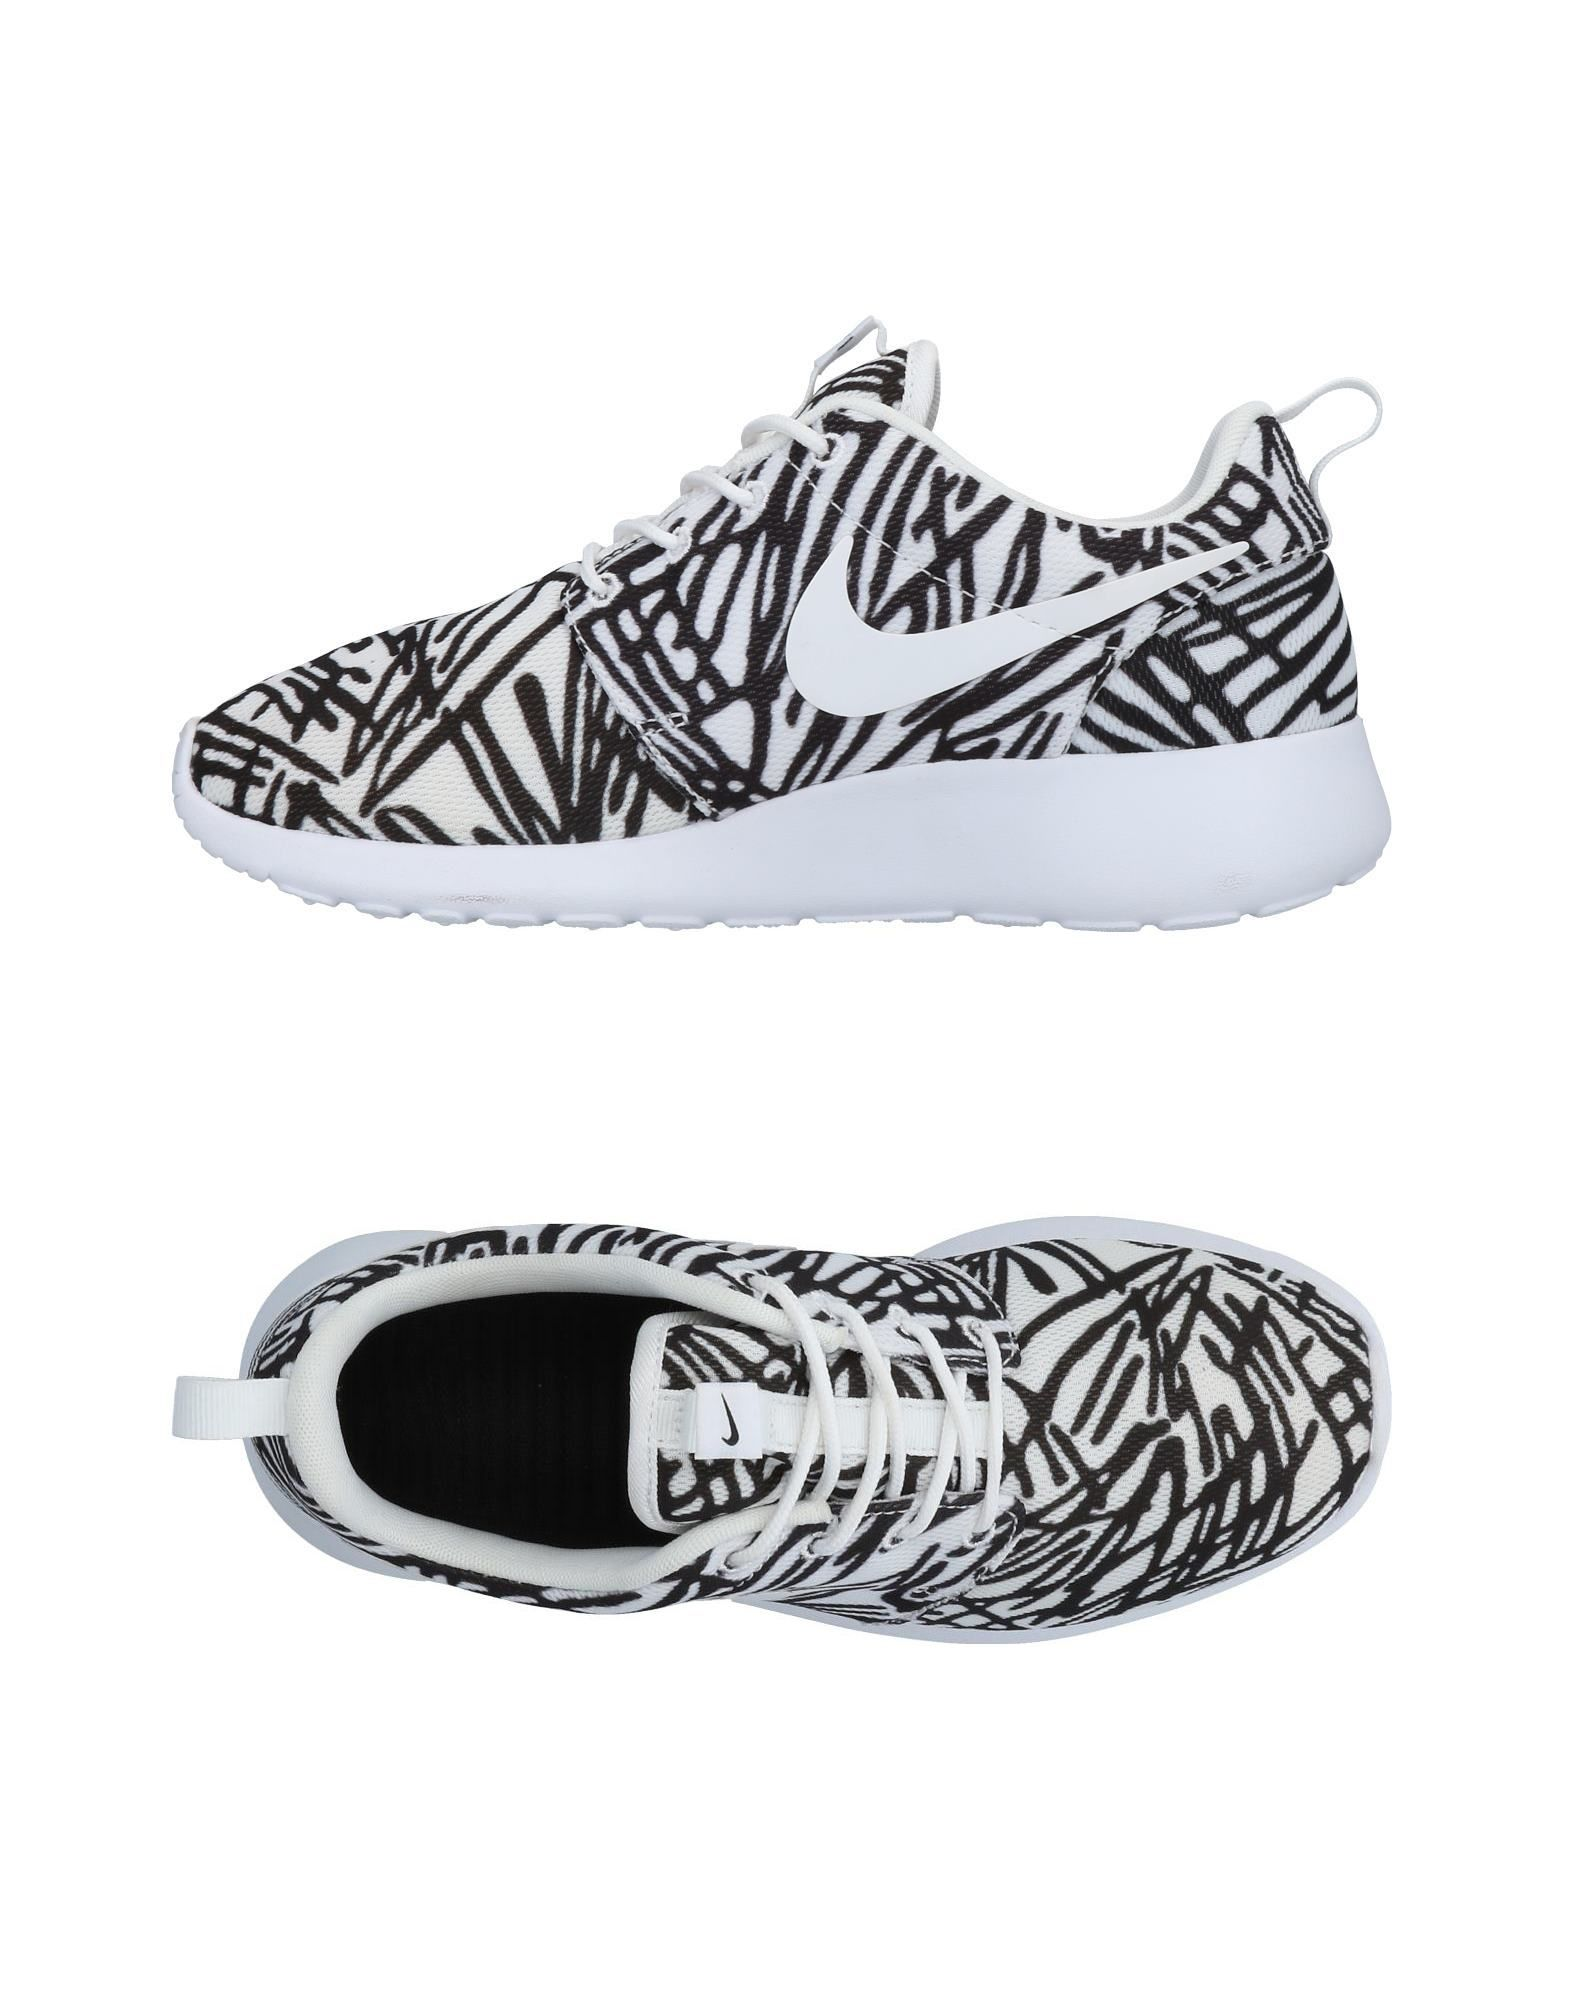 Moda - Sneakers Nike Donna - Moda 11486452VI 142548